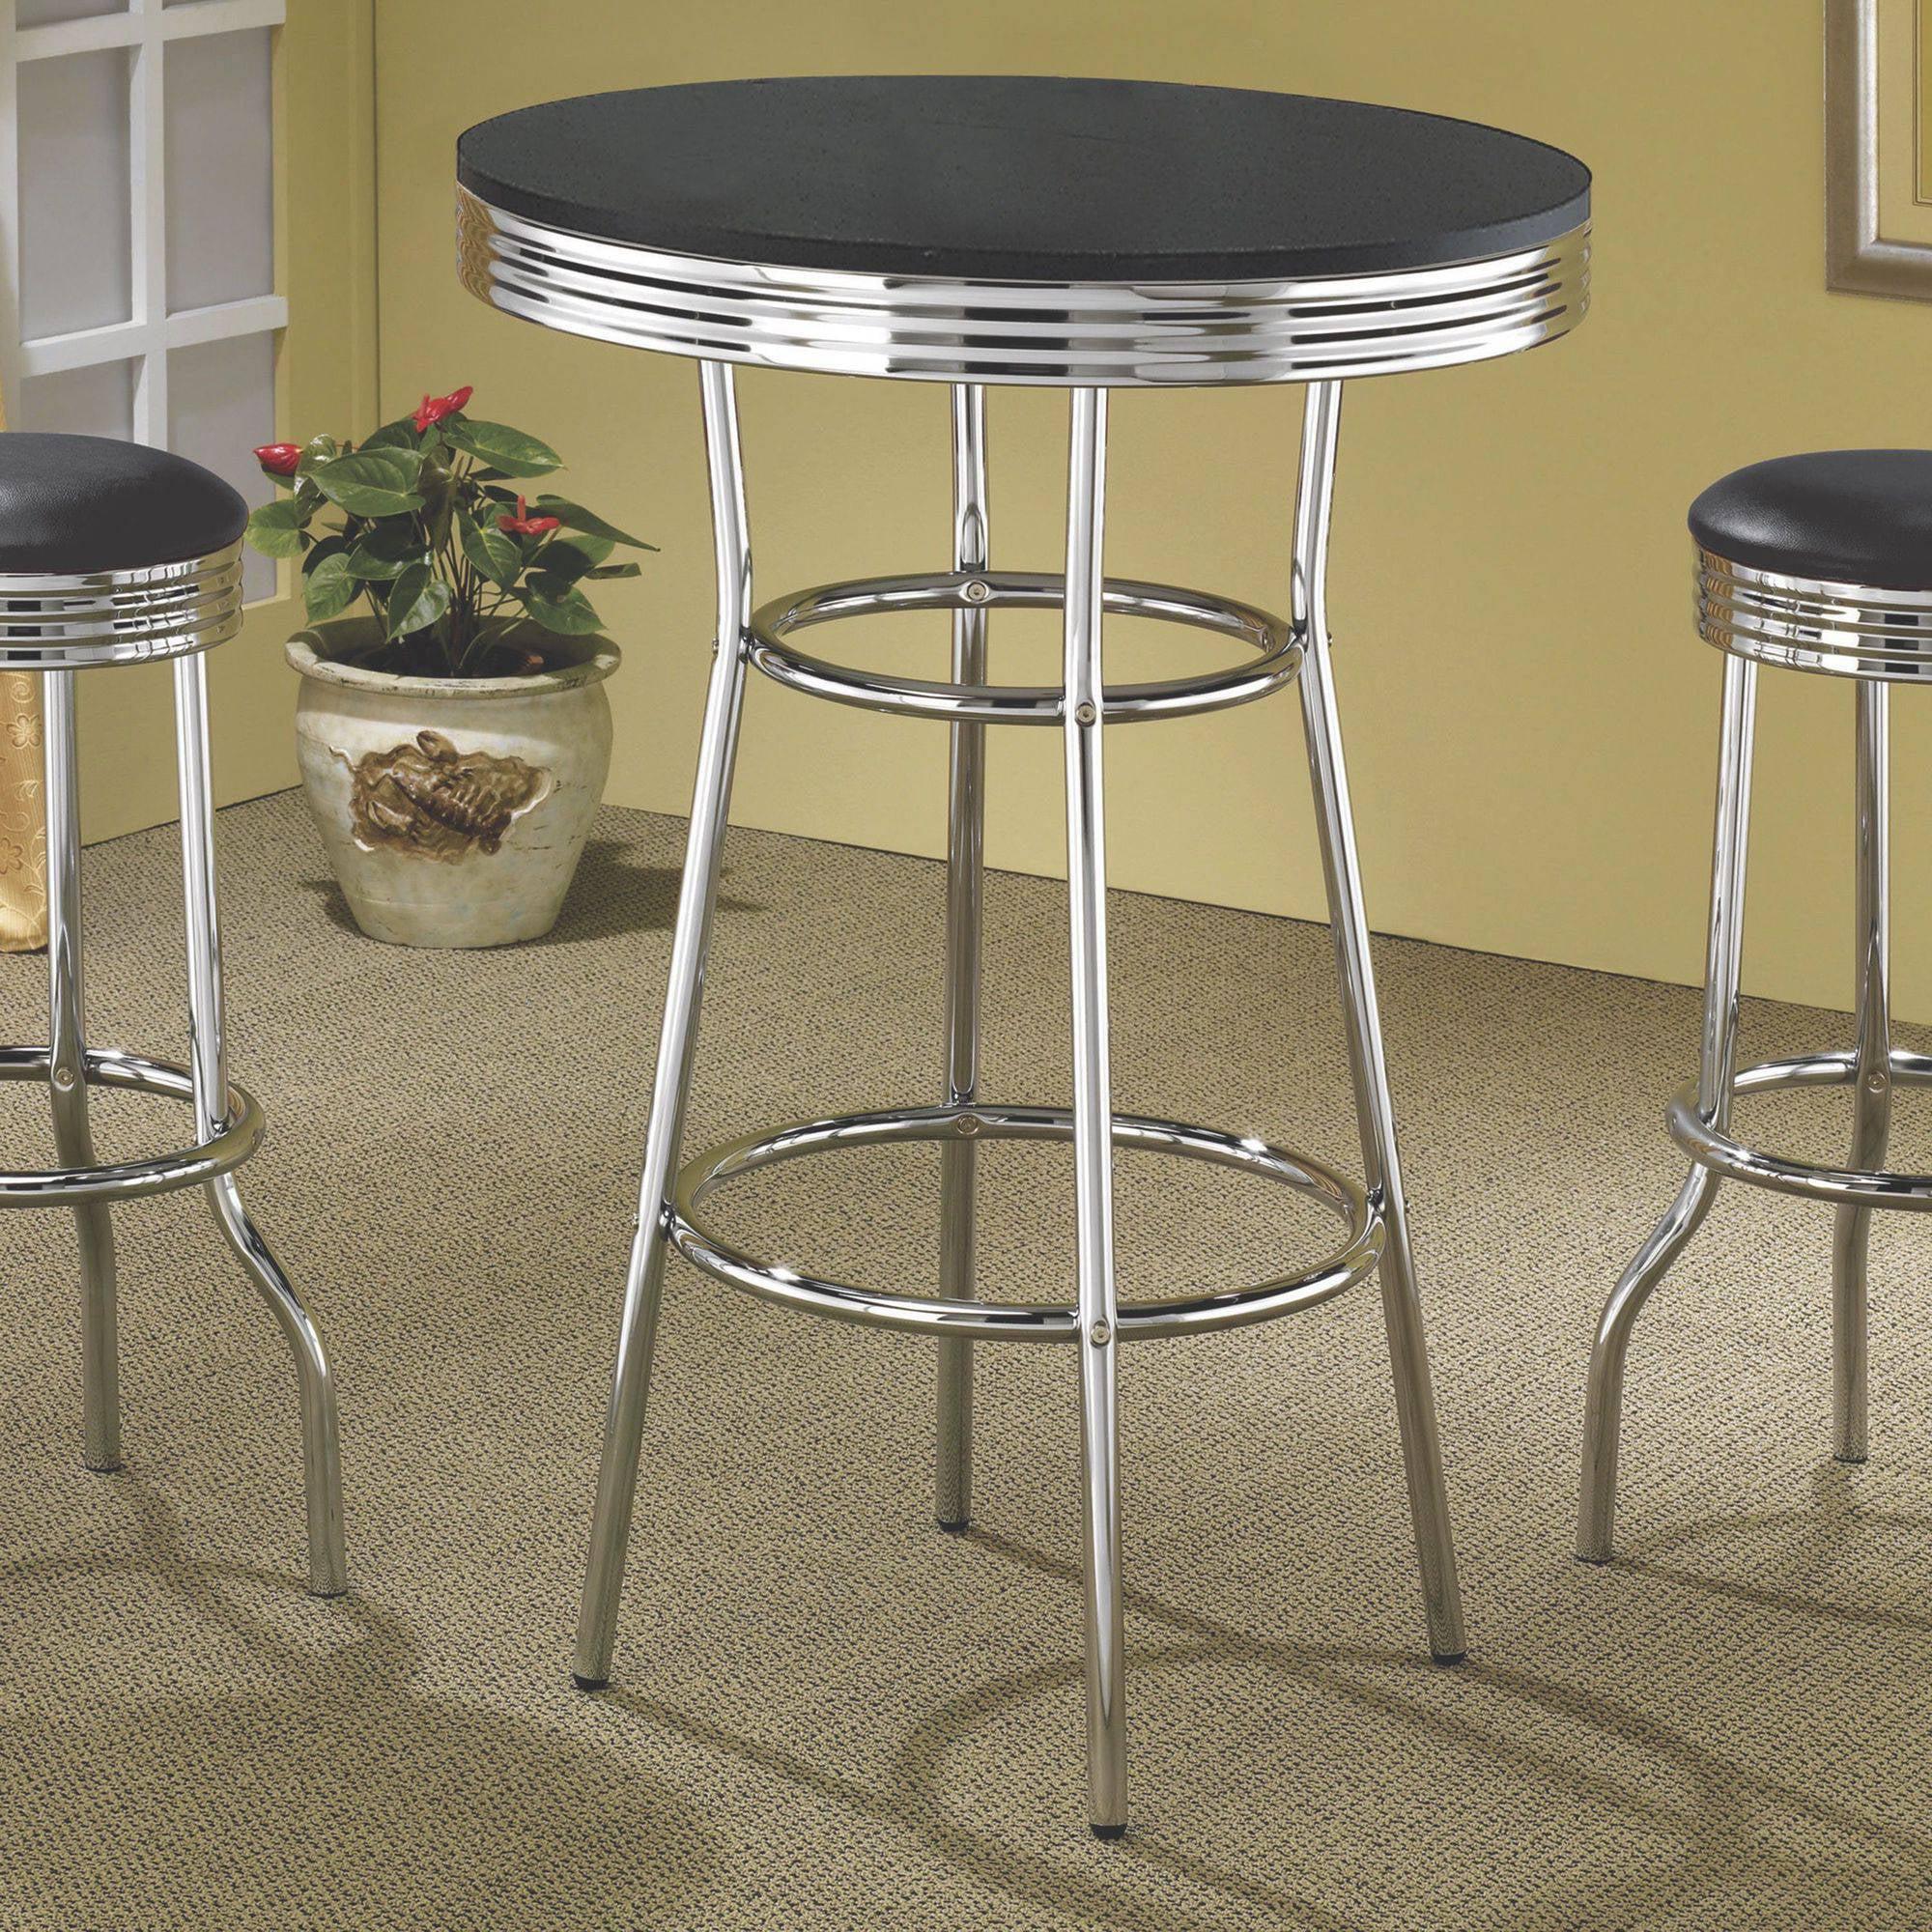 Coaster Company 1950's Black Retro Round Bar Table, Black/Chrome (stools sold separately)